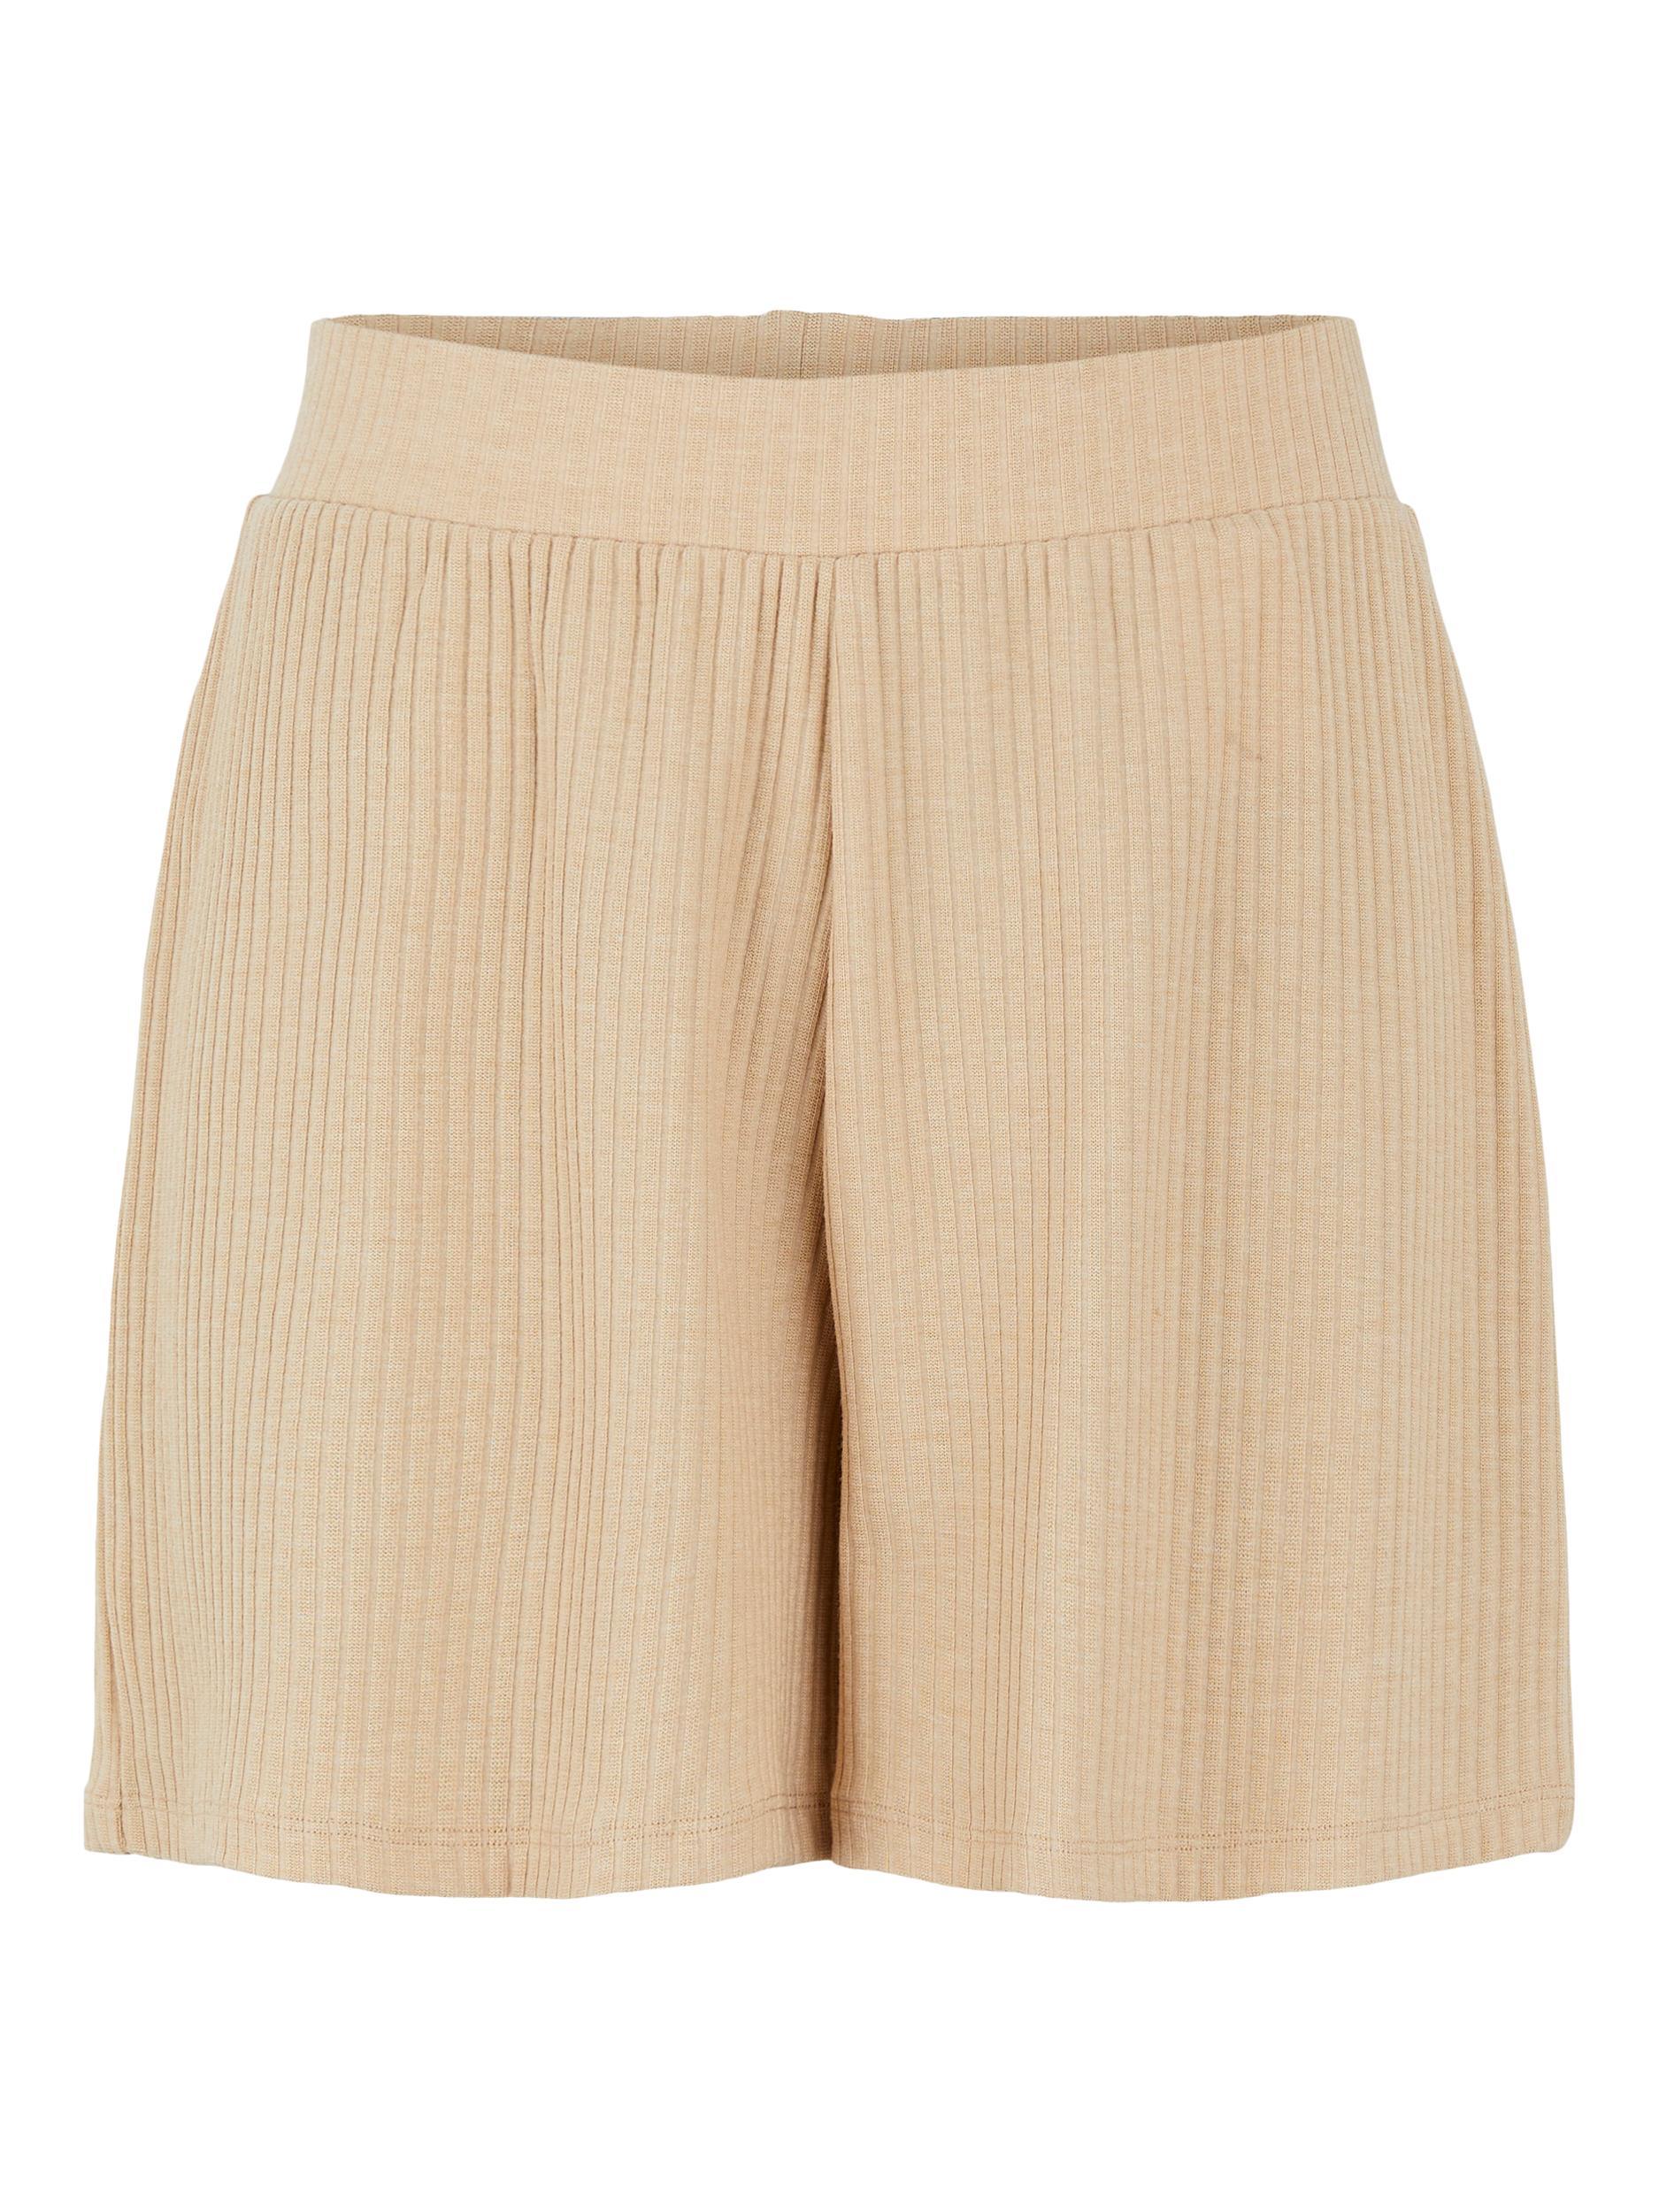 Pieces Ribbi shorts, cuban sand, medium